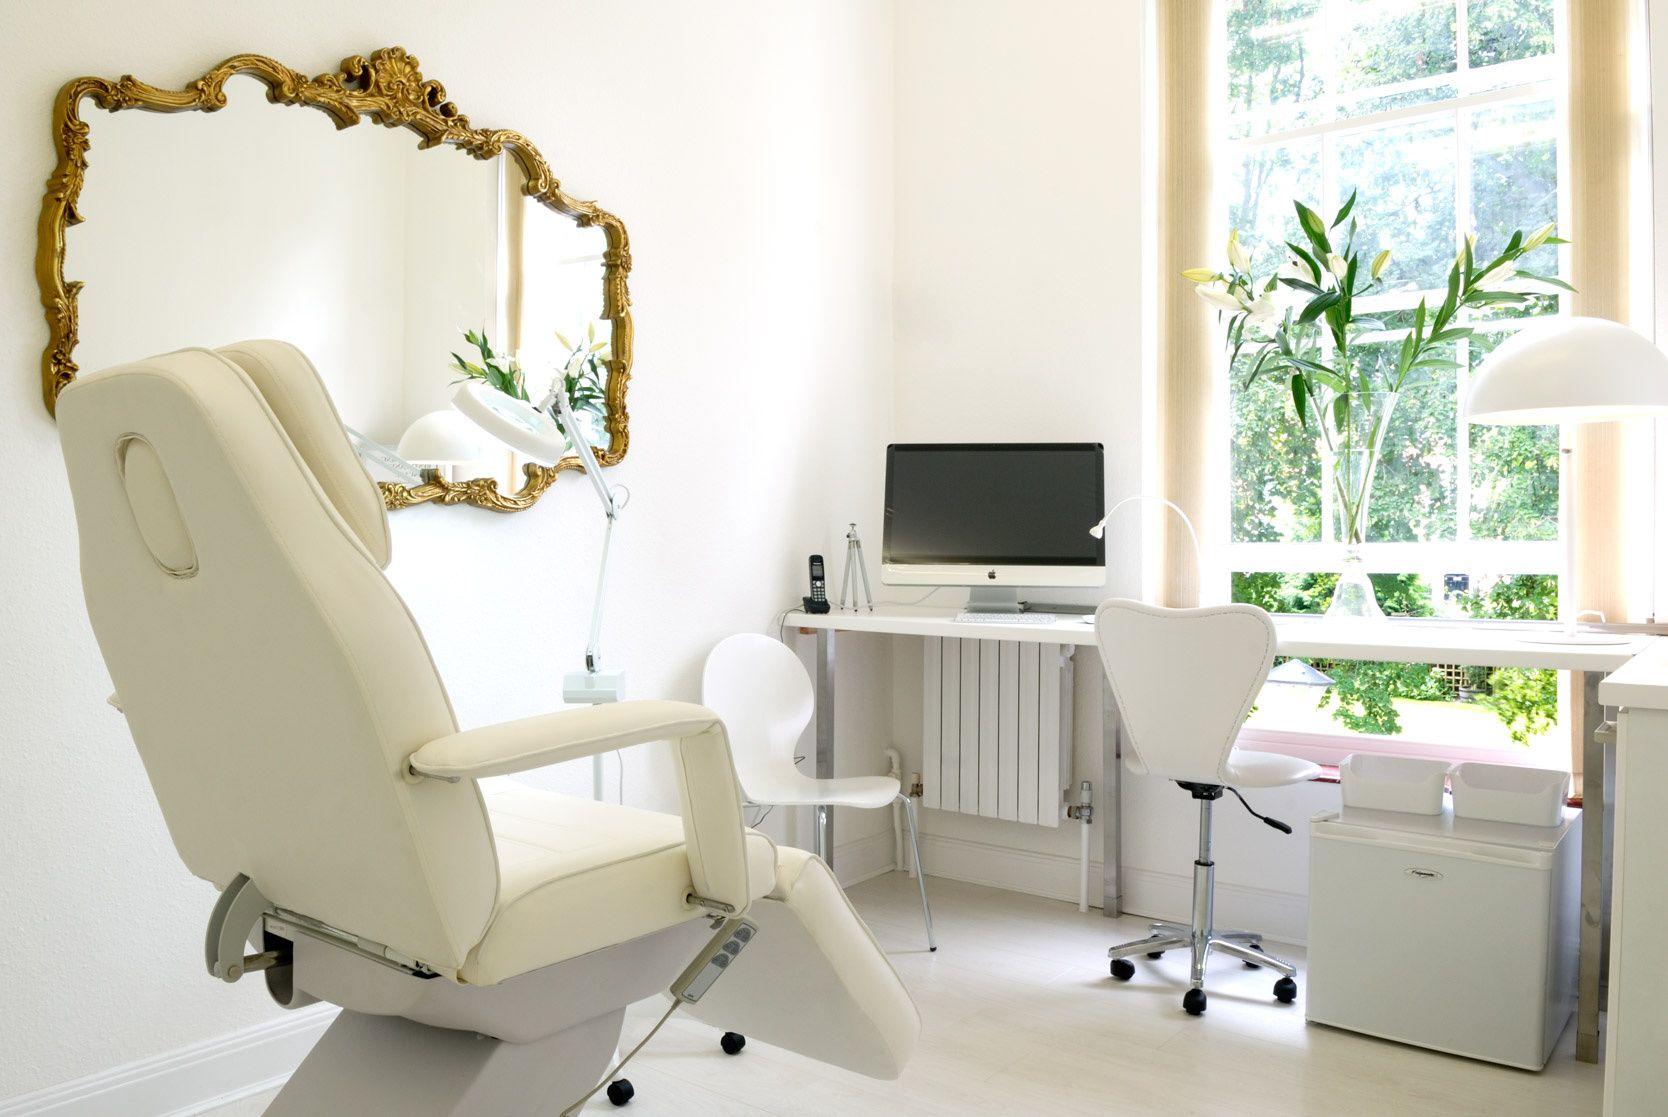 Aesthetic clinic decoration penelusuran google room for Beauty treatment room decor ideas